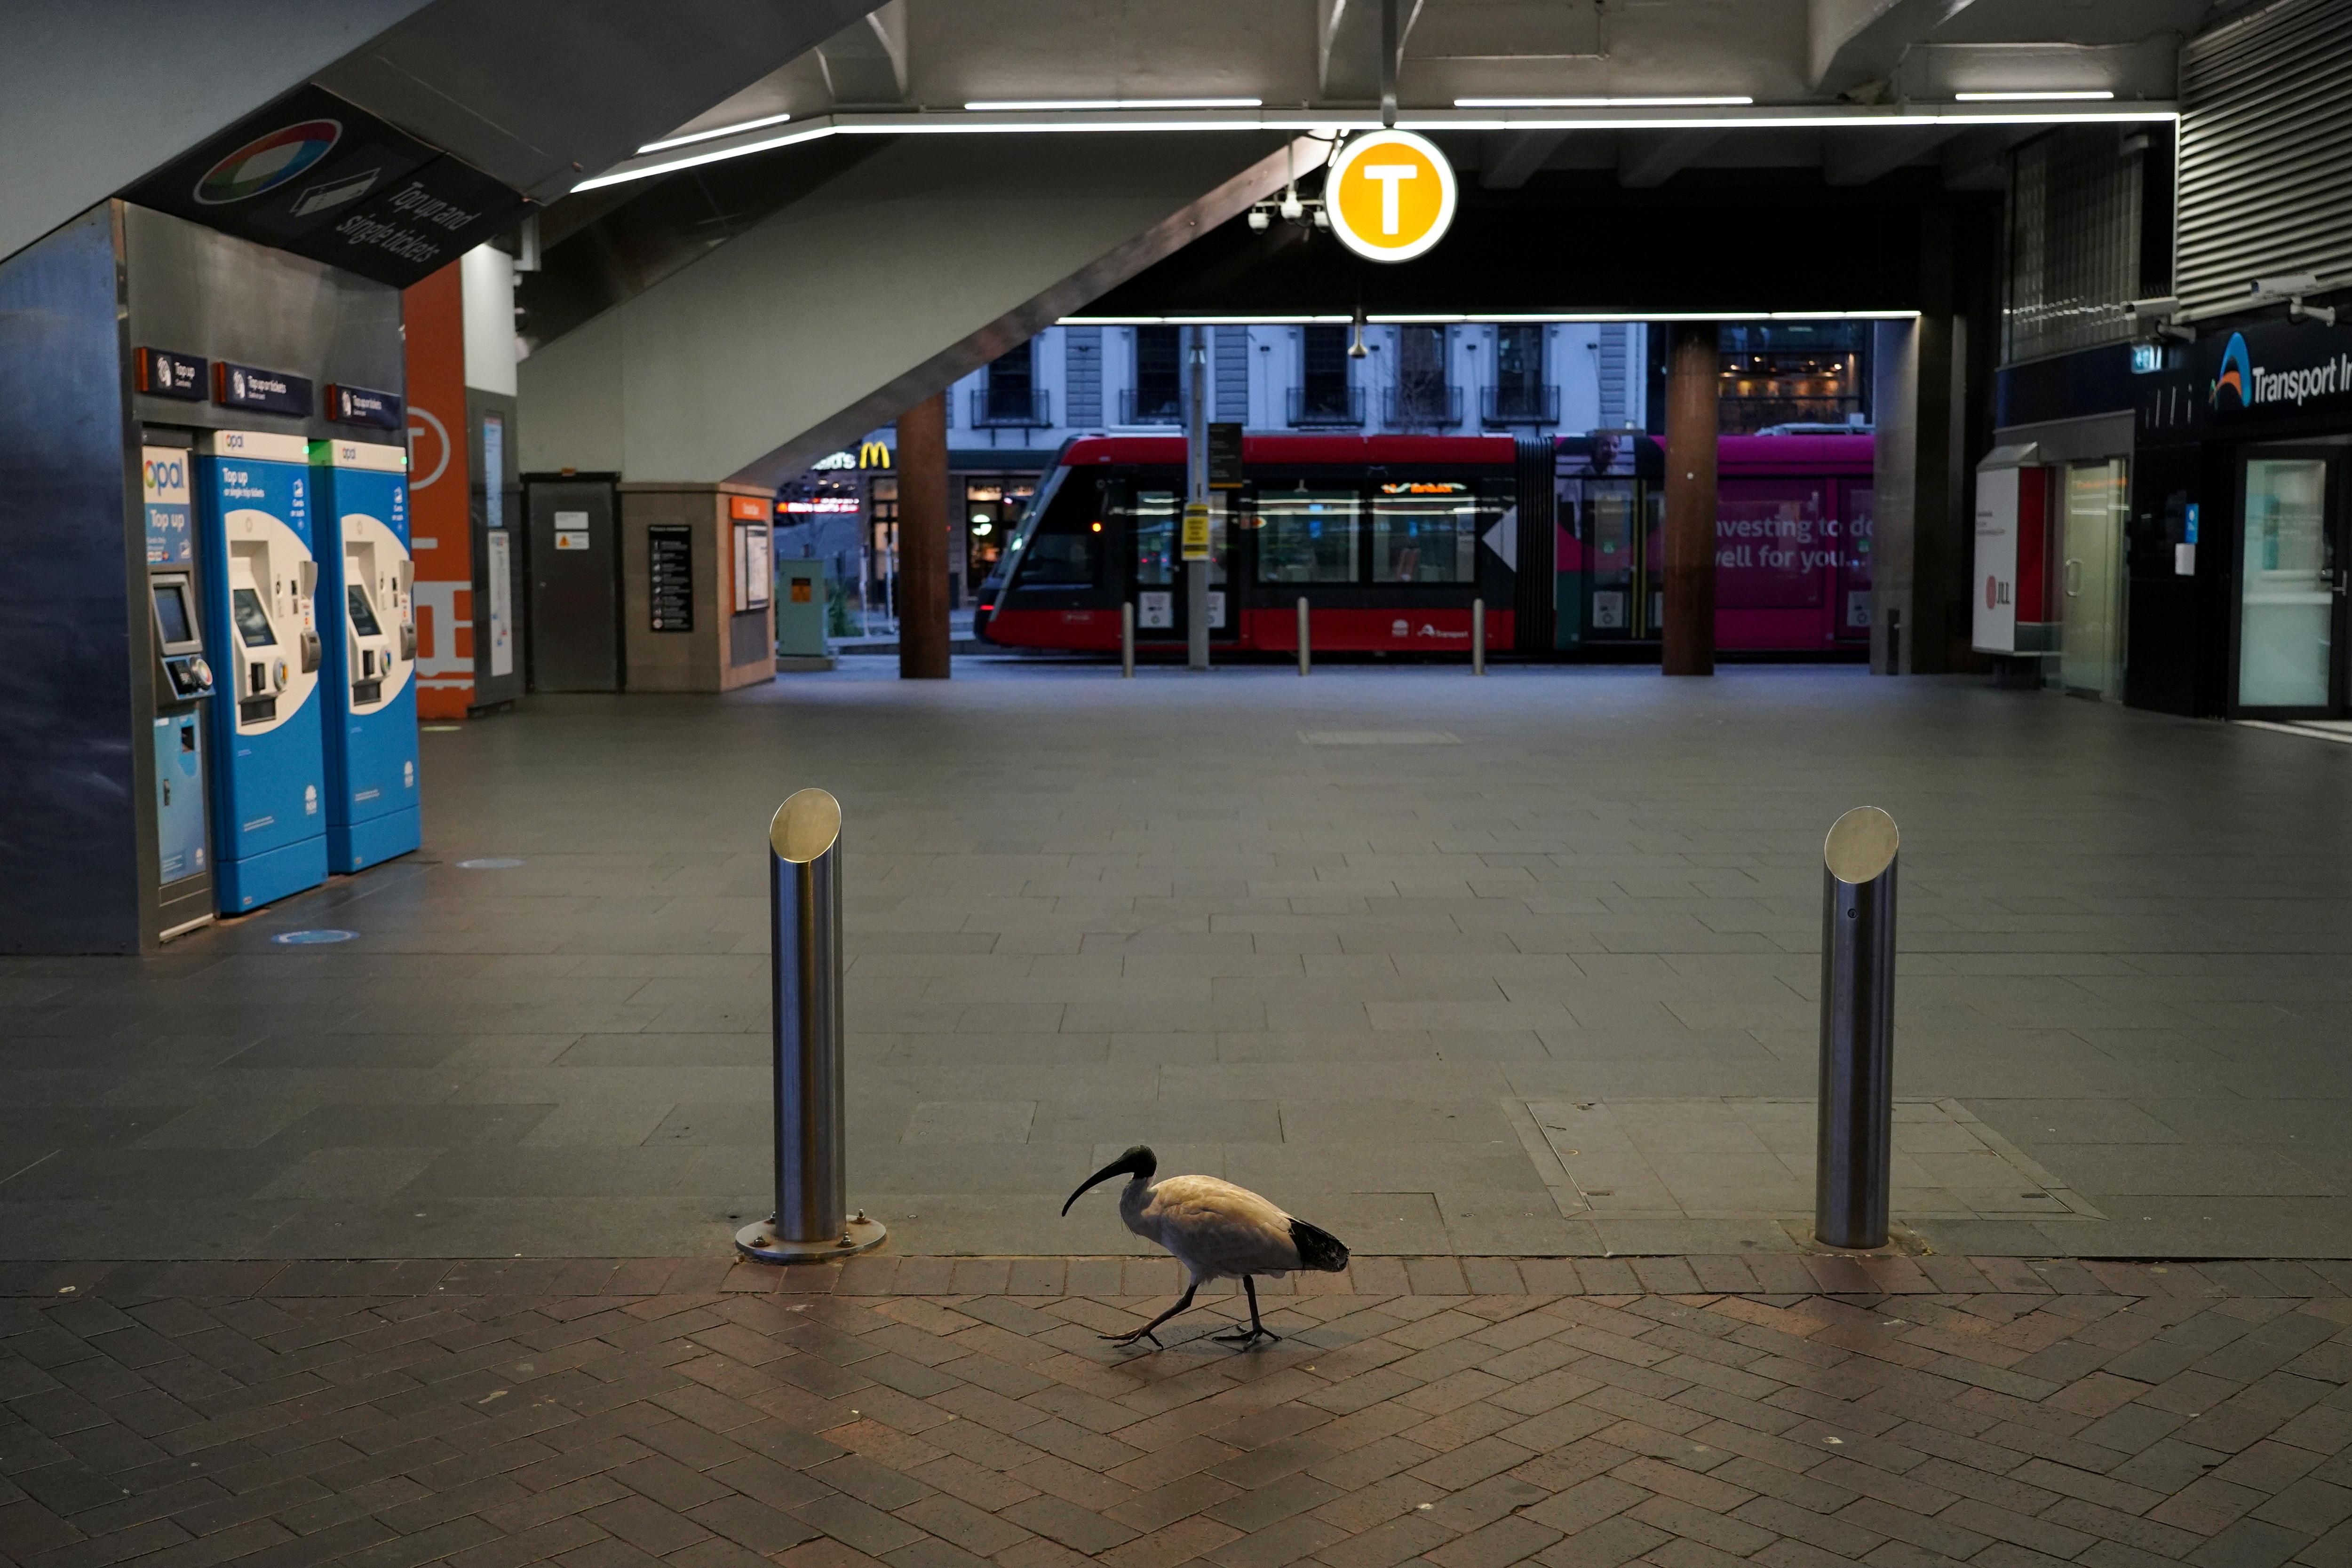 A lone bird walks past the quiet Circular Quay train station during a lockdown to curb the spread of a coronavirus disease (COVID-19) outbreak in Sydney, Australia, July 28, 2021.  REUTERS/Loren Elliott